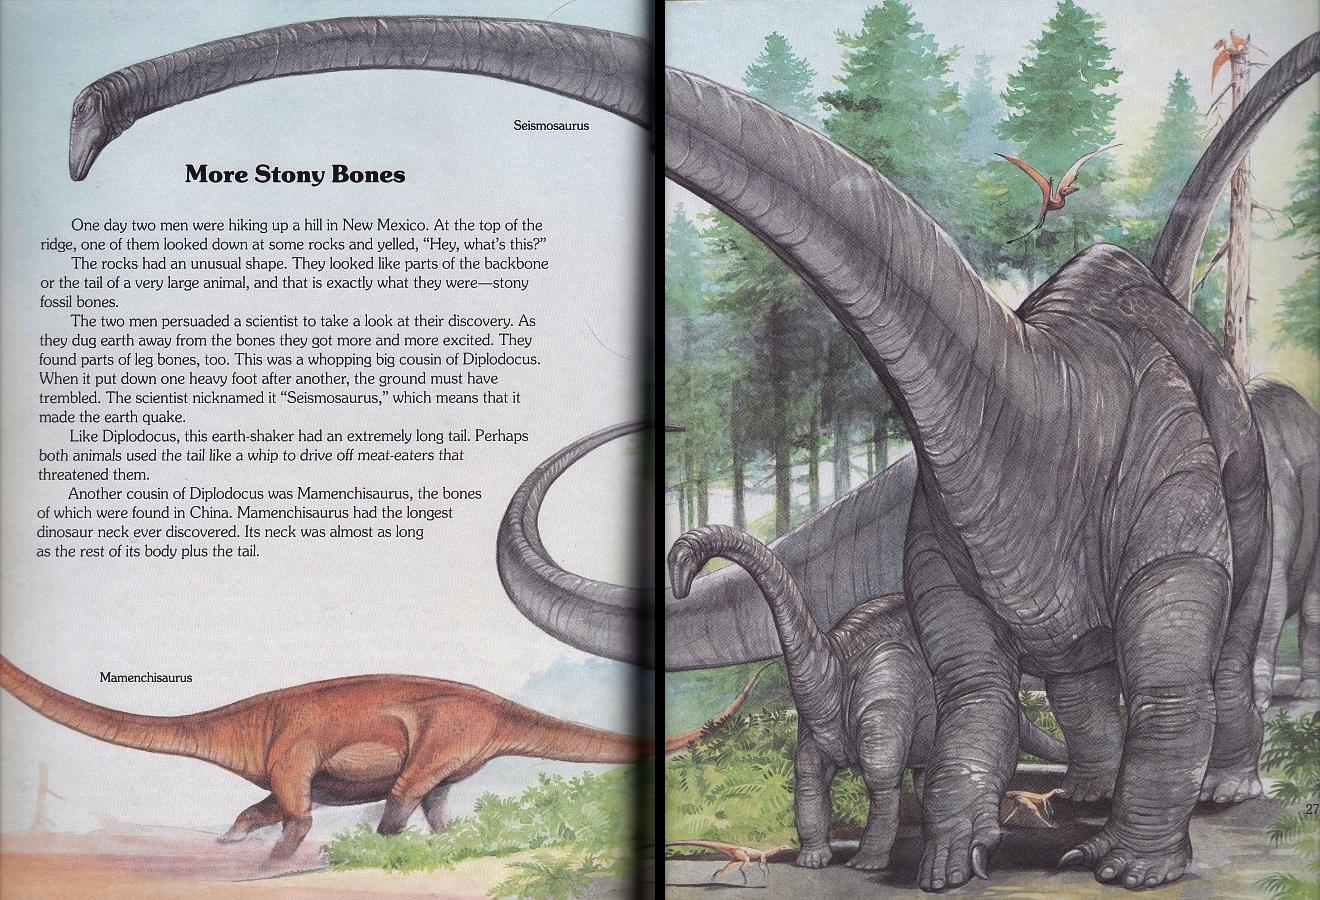 Seismosaurus by Christopher Santoro